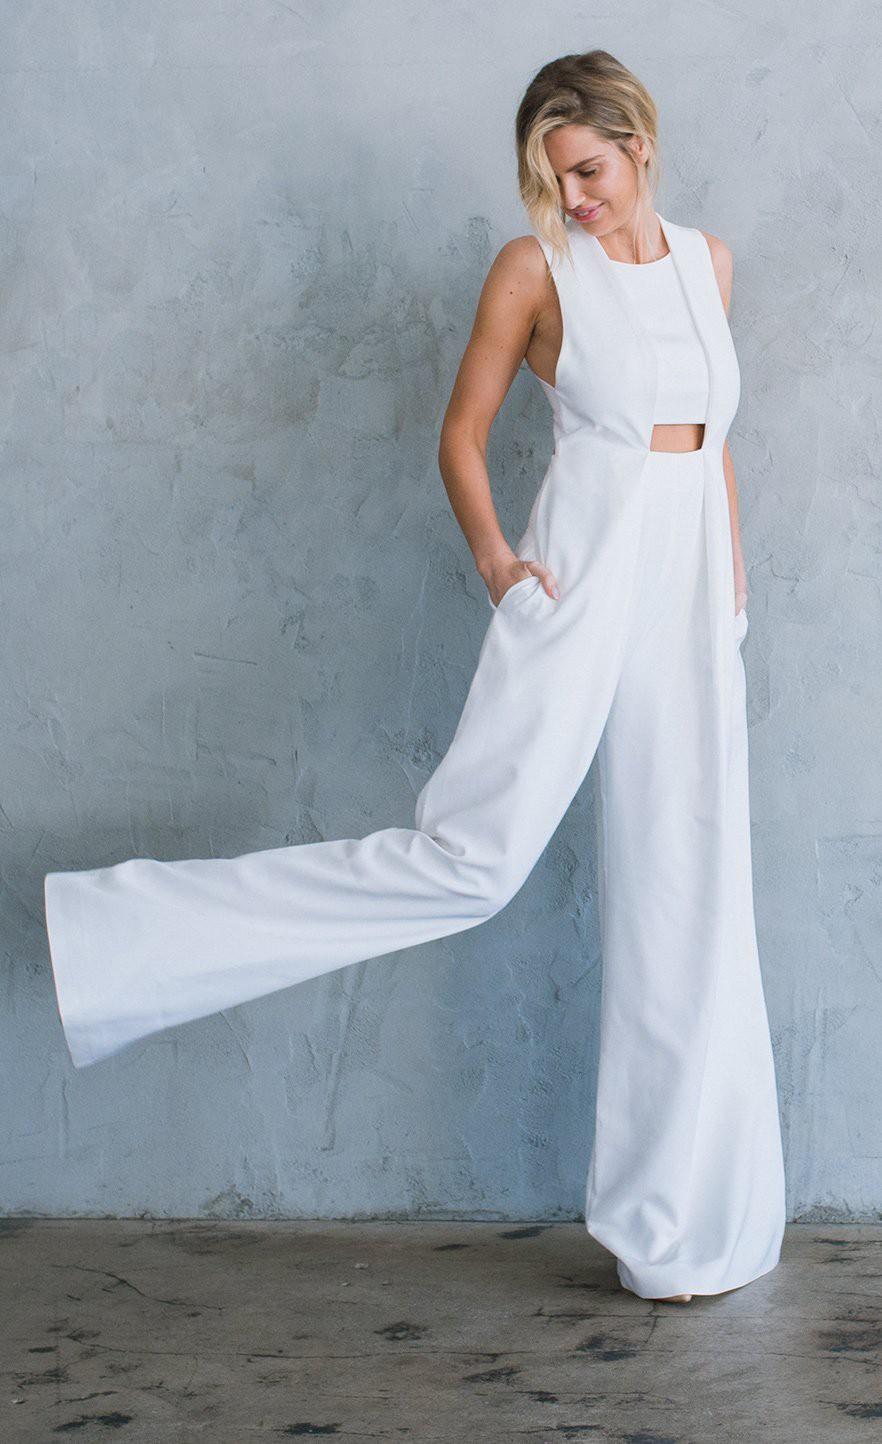 Daring Menswear Inspired Bridal Styles